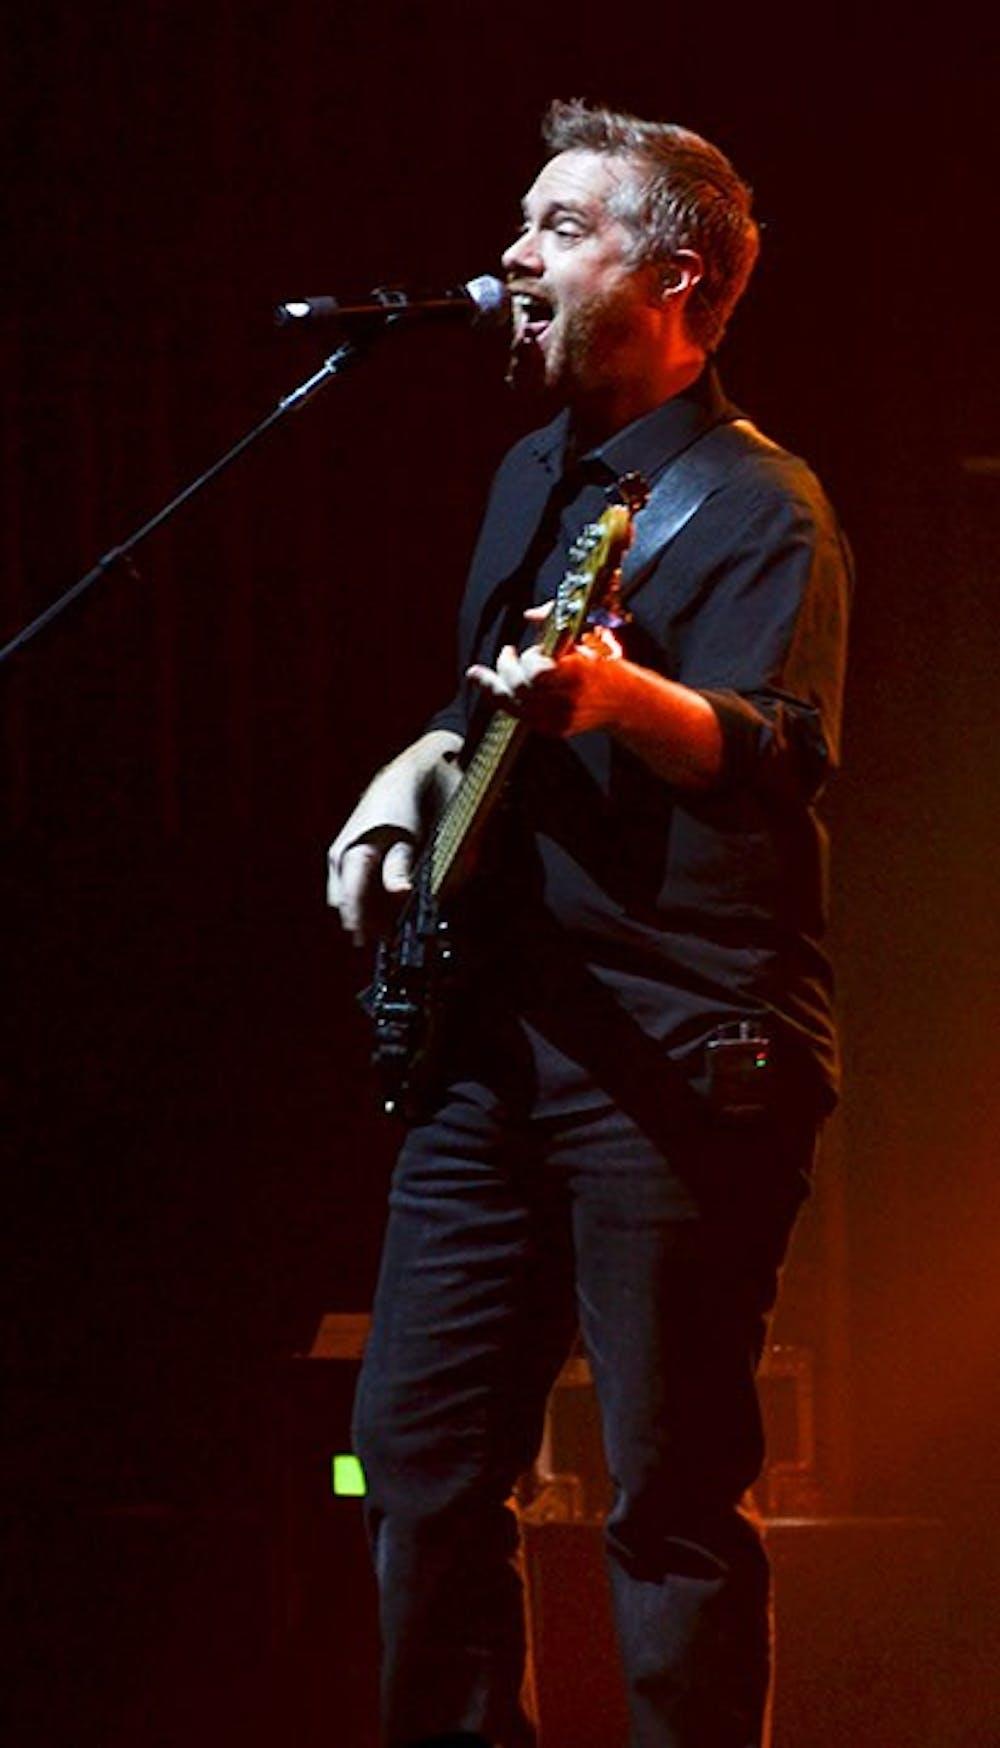 Brit Floyd reinvents Pink Floyd music